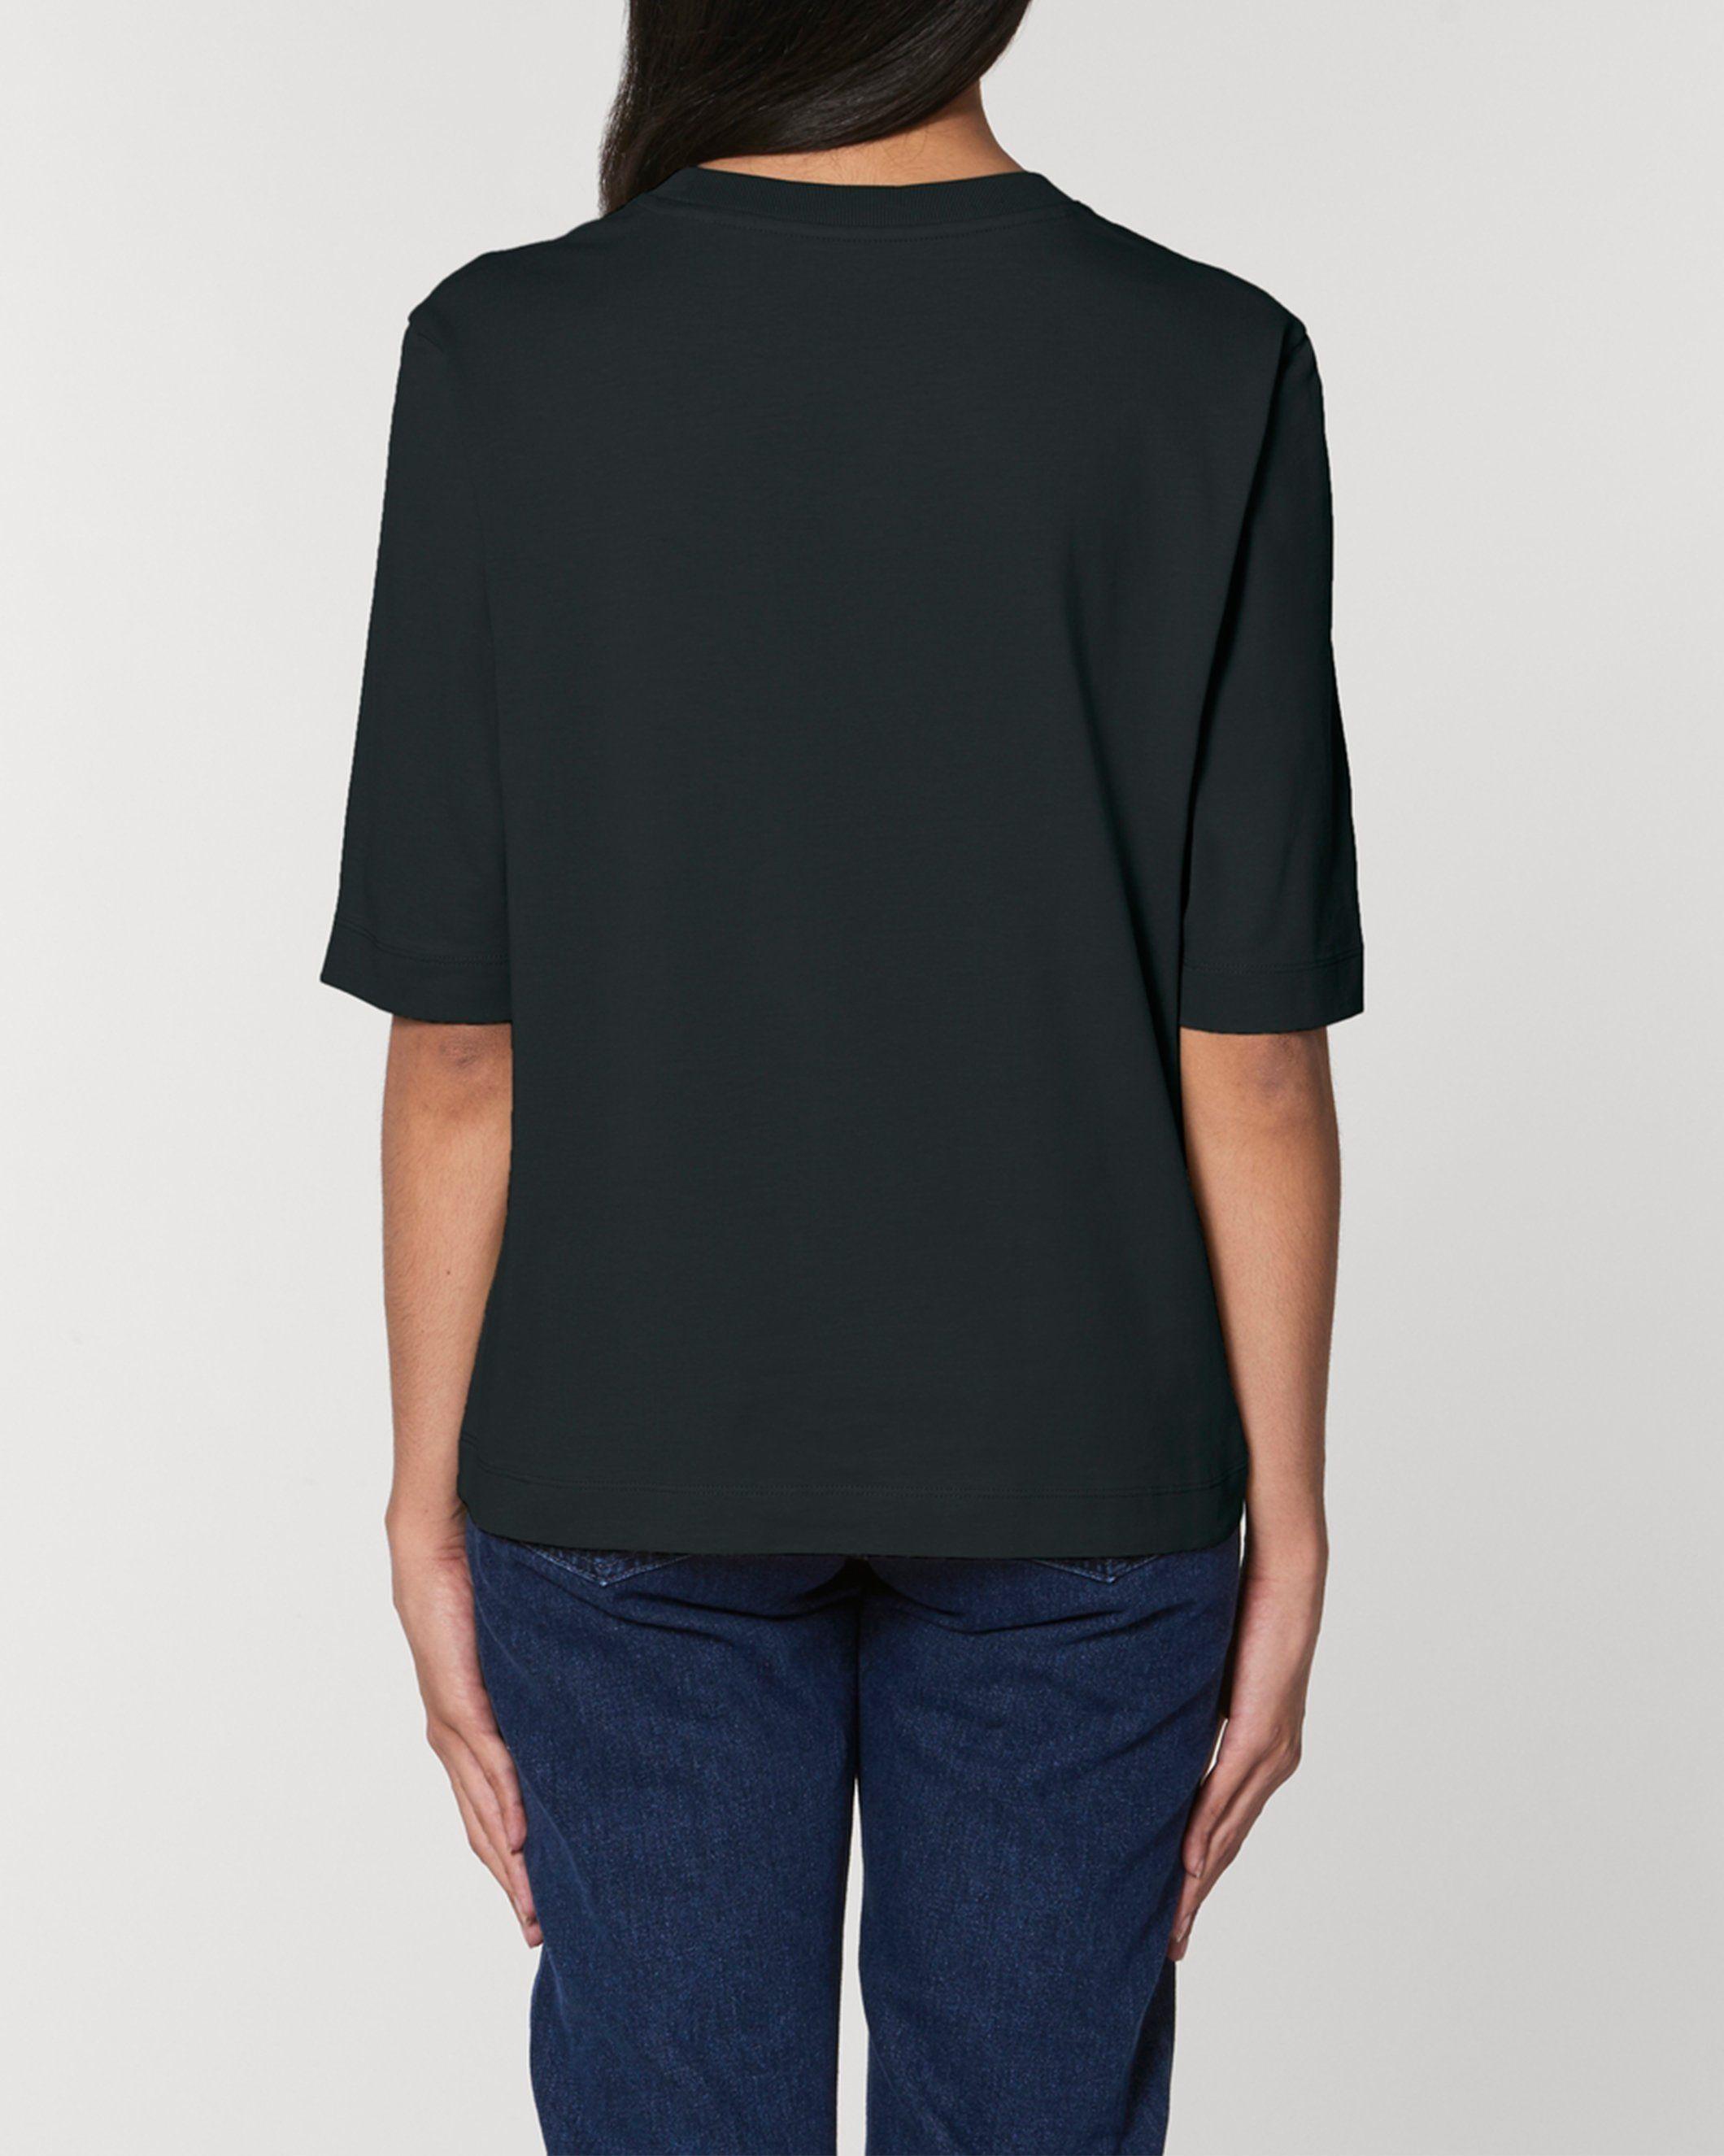 Bandham Women's Boxy Heavy T-Shirt in Black